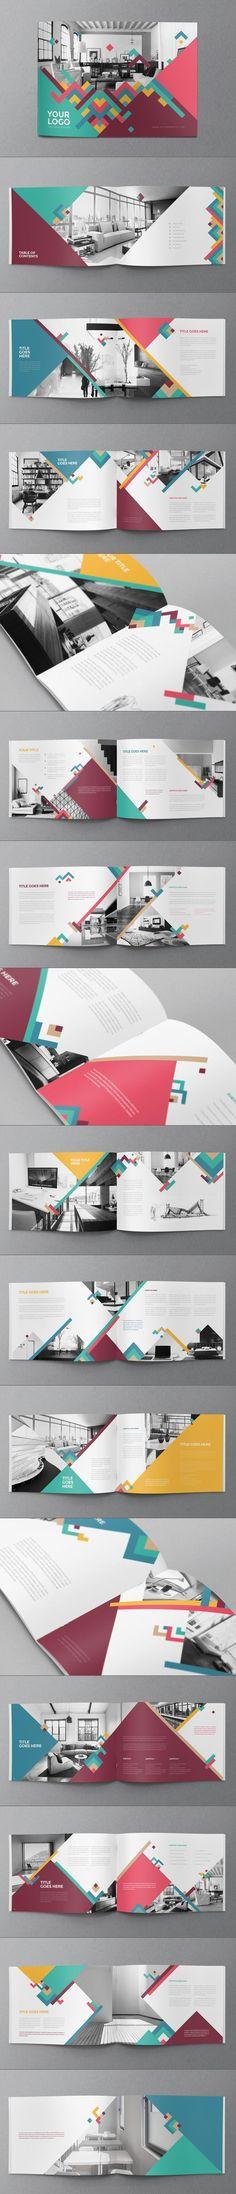 Colorful Pattern Brochure 2. Download here: http://graphicriver.net/item/colorful-pattern-brochure-2/8113993?ref=abradesign #design #brochure #LandscapeLayout